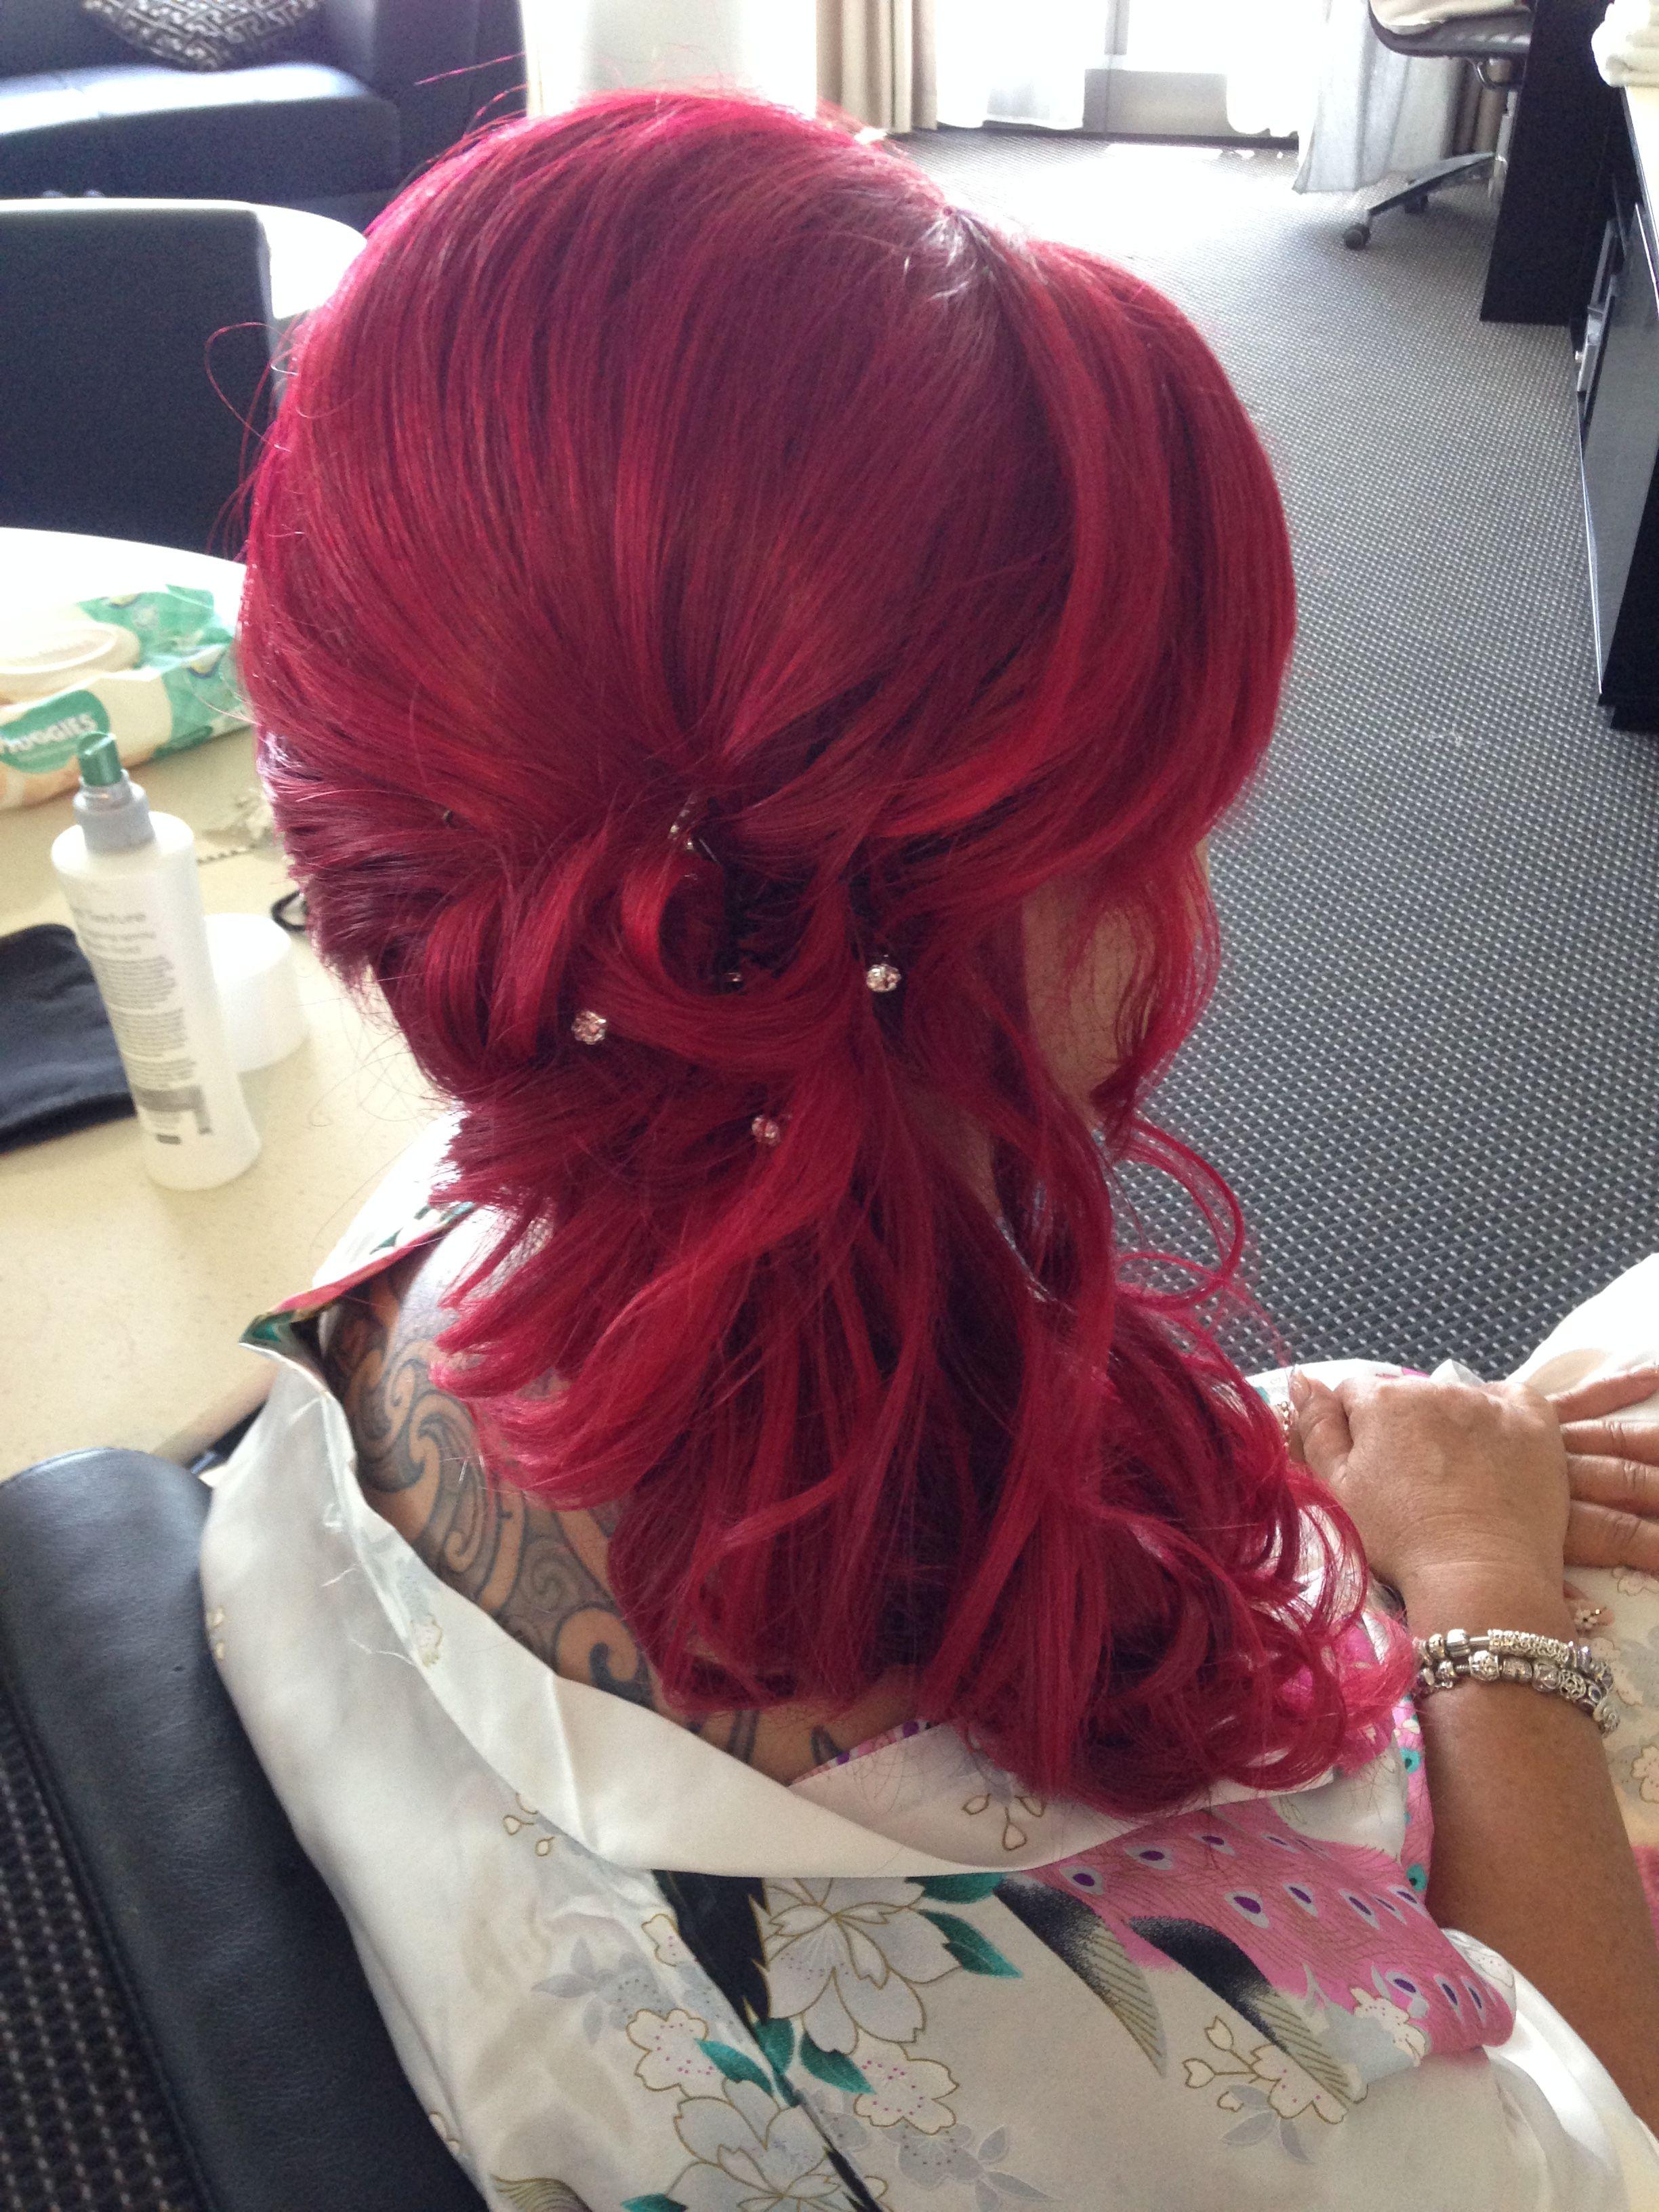 Brisbane Bridal Hair by An Eye For Style ทรงผม